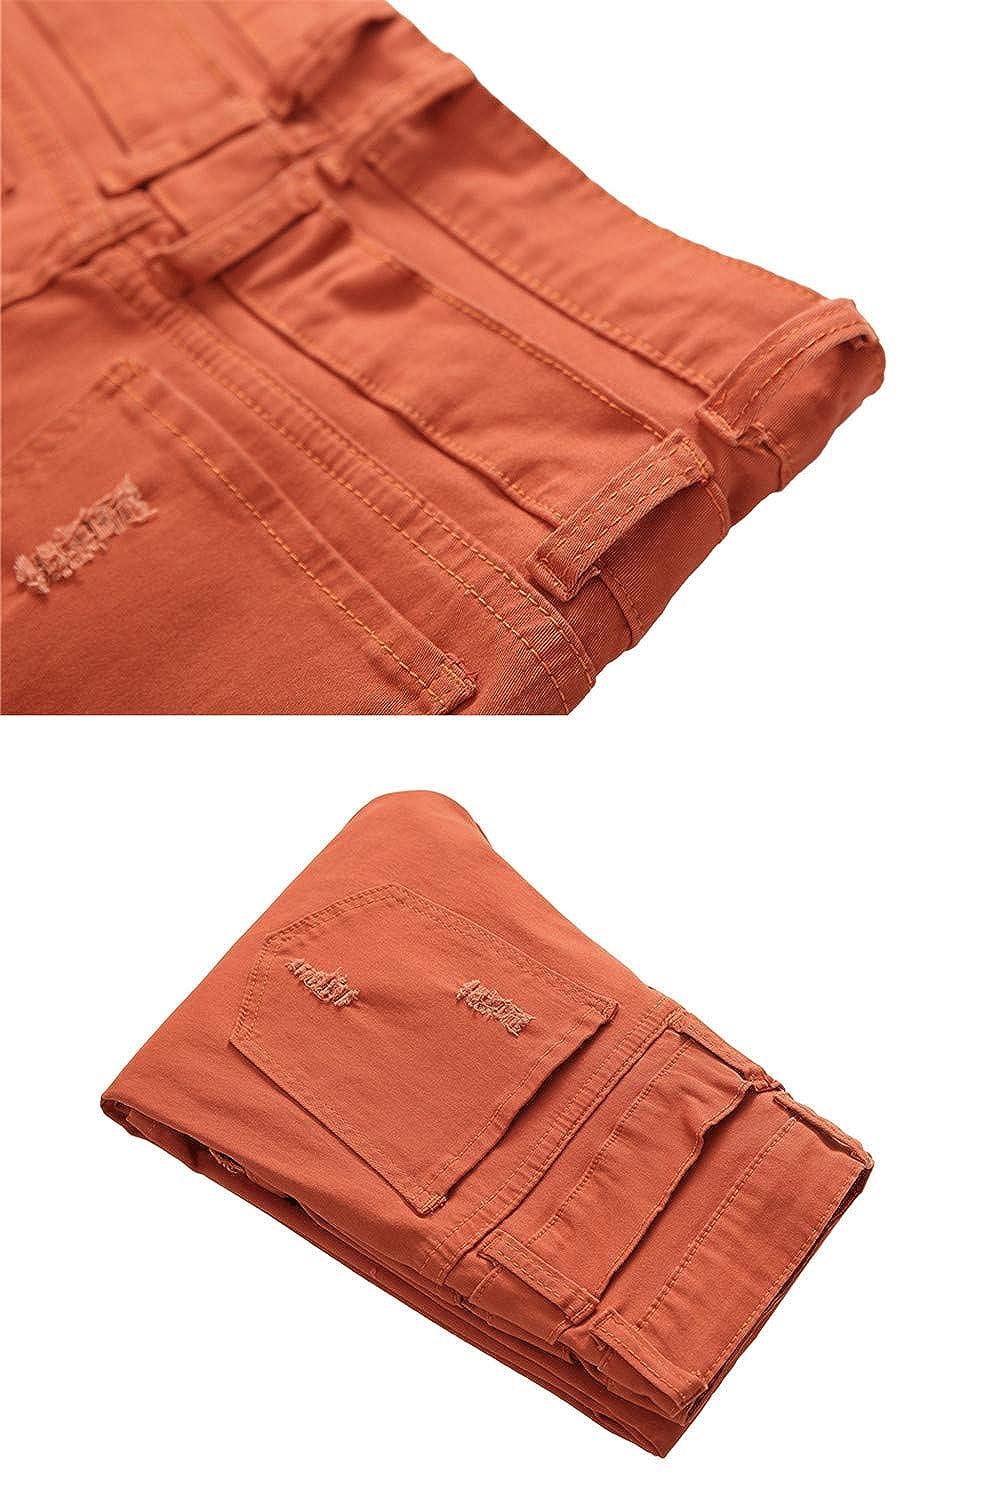 Newnorthstar Clothing Mens Slim Hole Ripped Jeans Denim Pants Men Denim Pants Elastic Jeans Orange